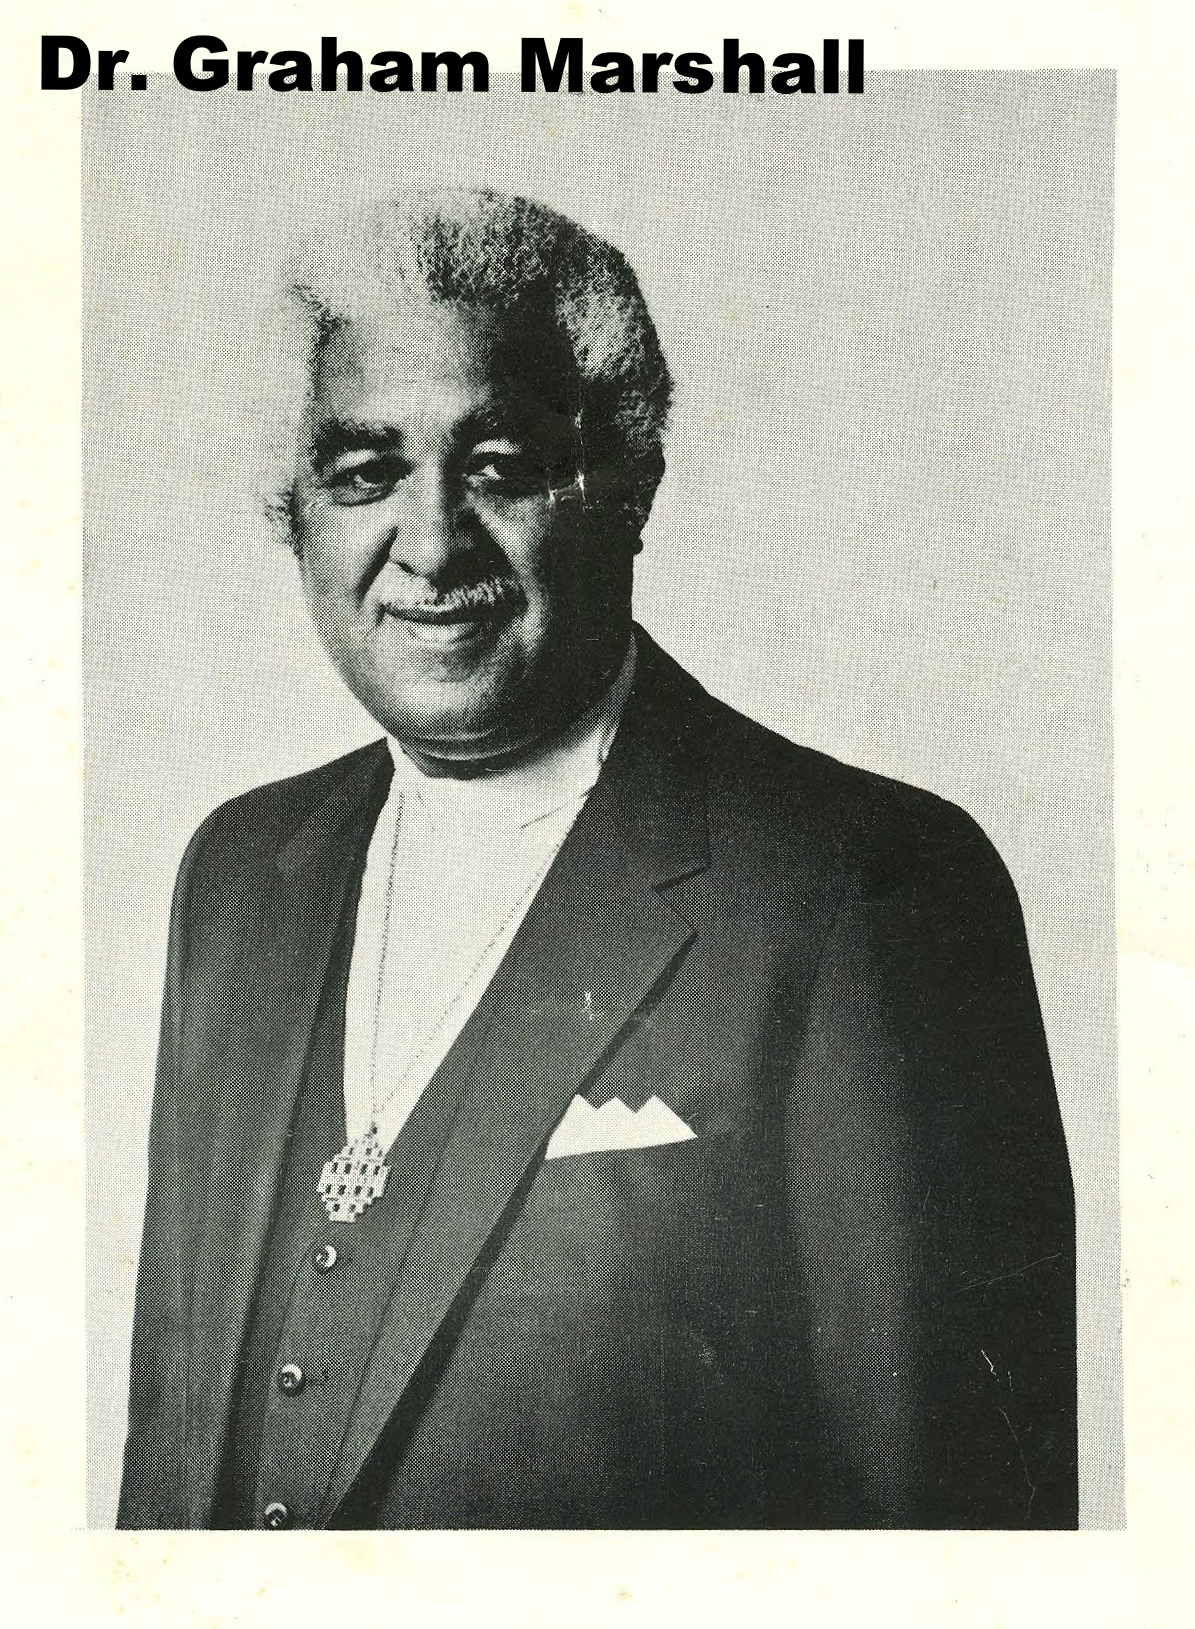 Dr. Graham Marshall